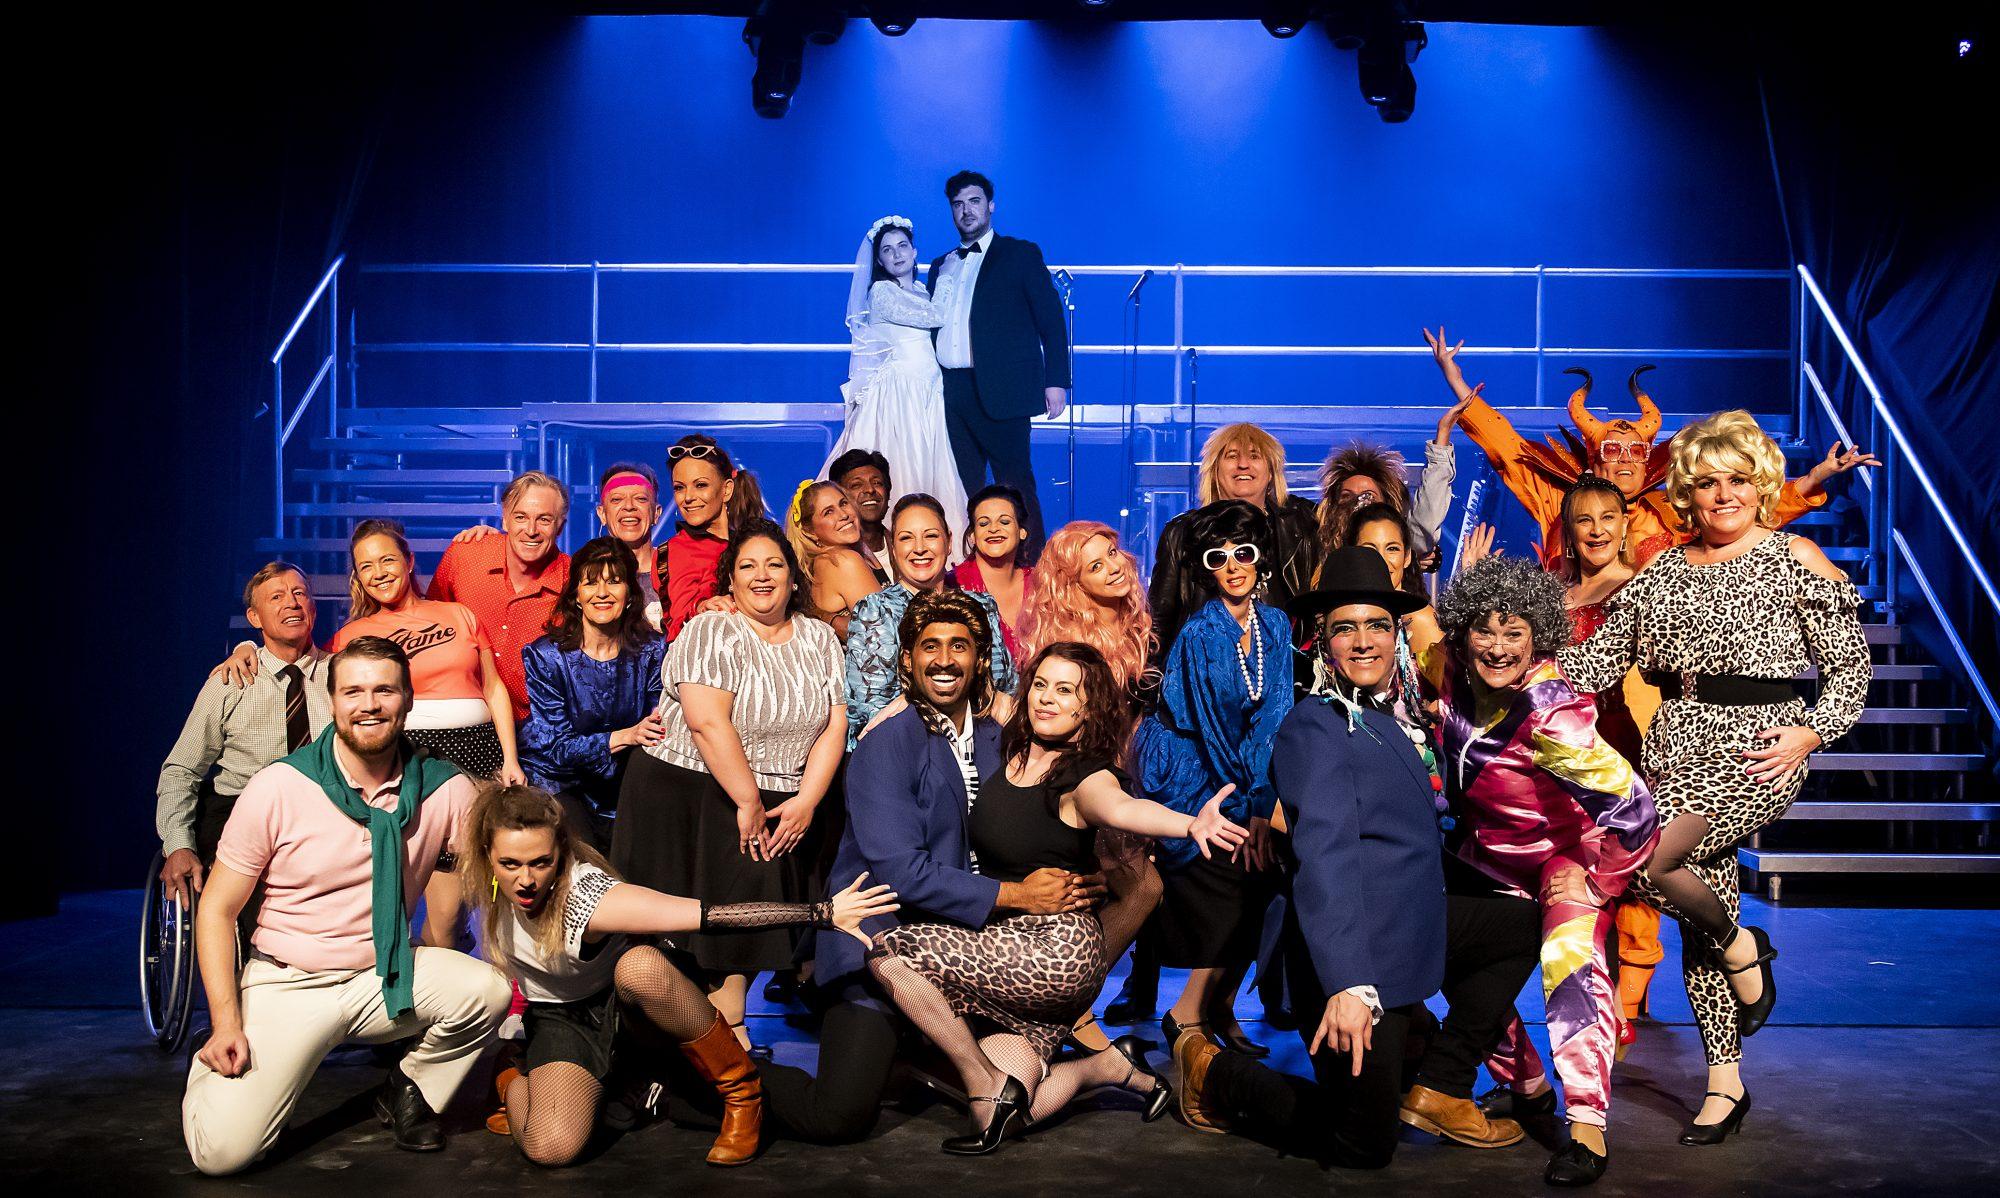 Radlett Musical Theatre Company